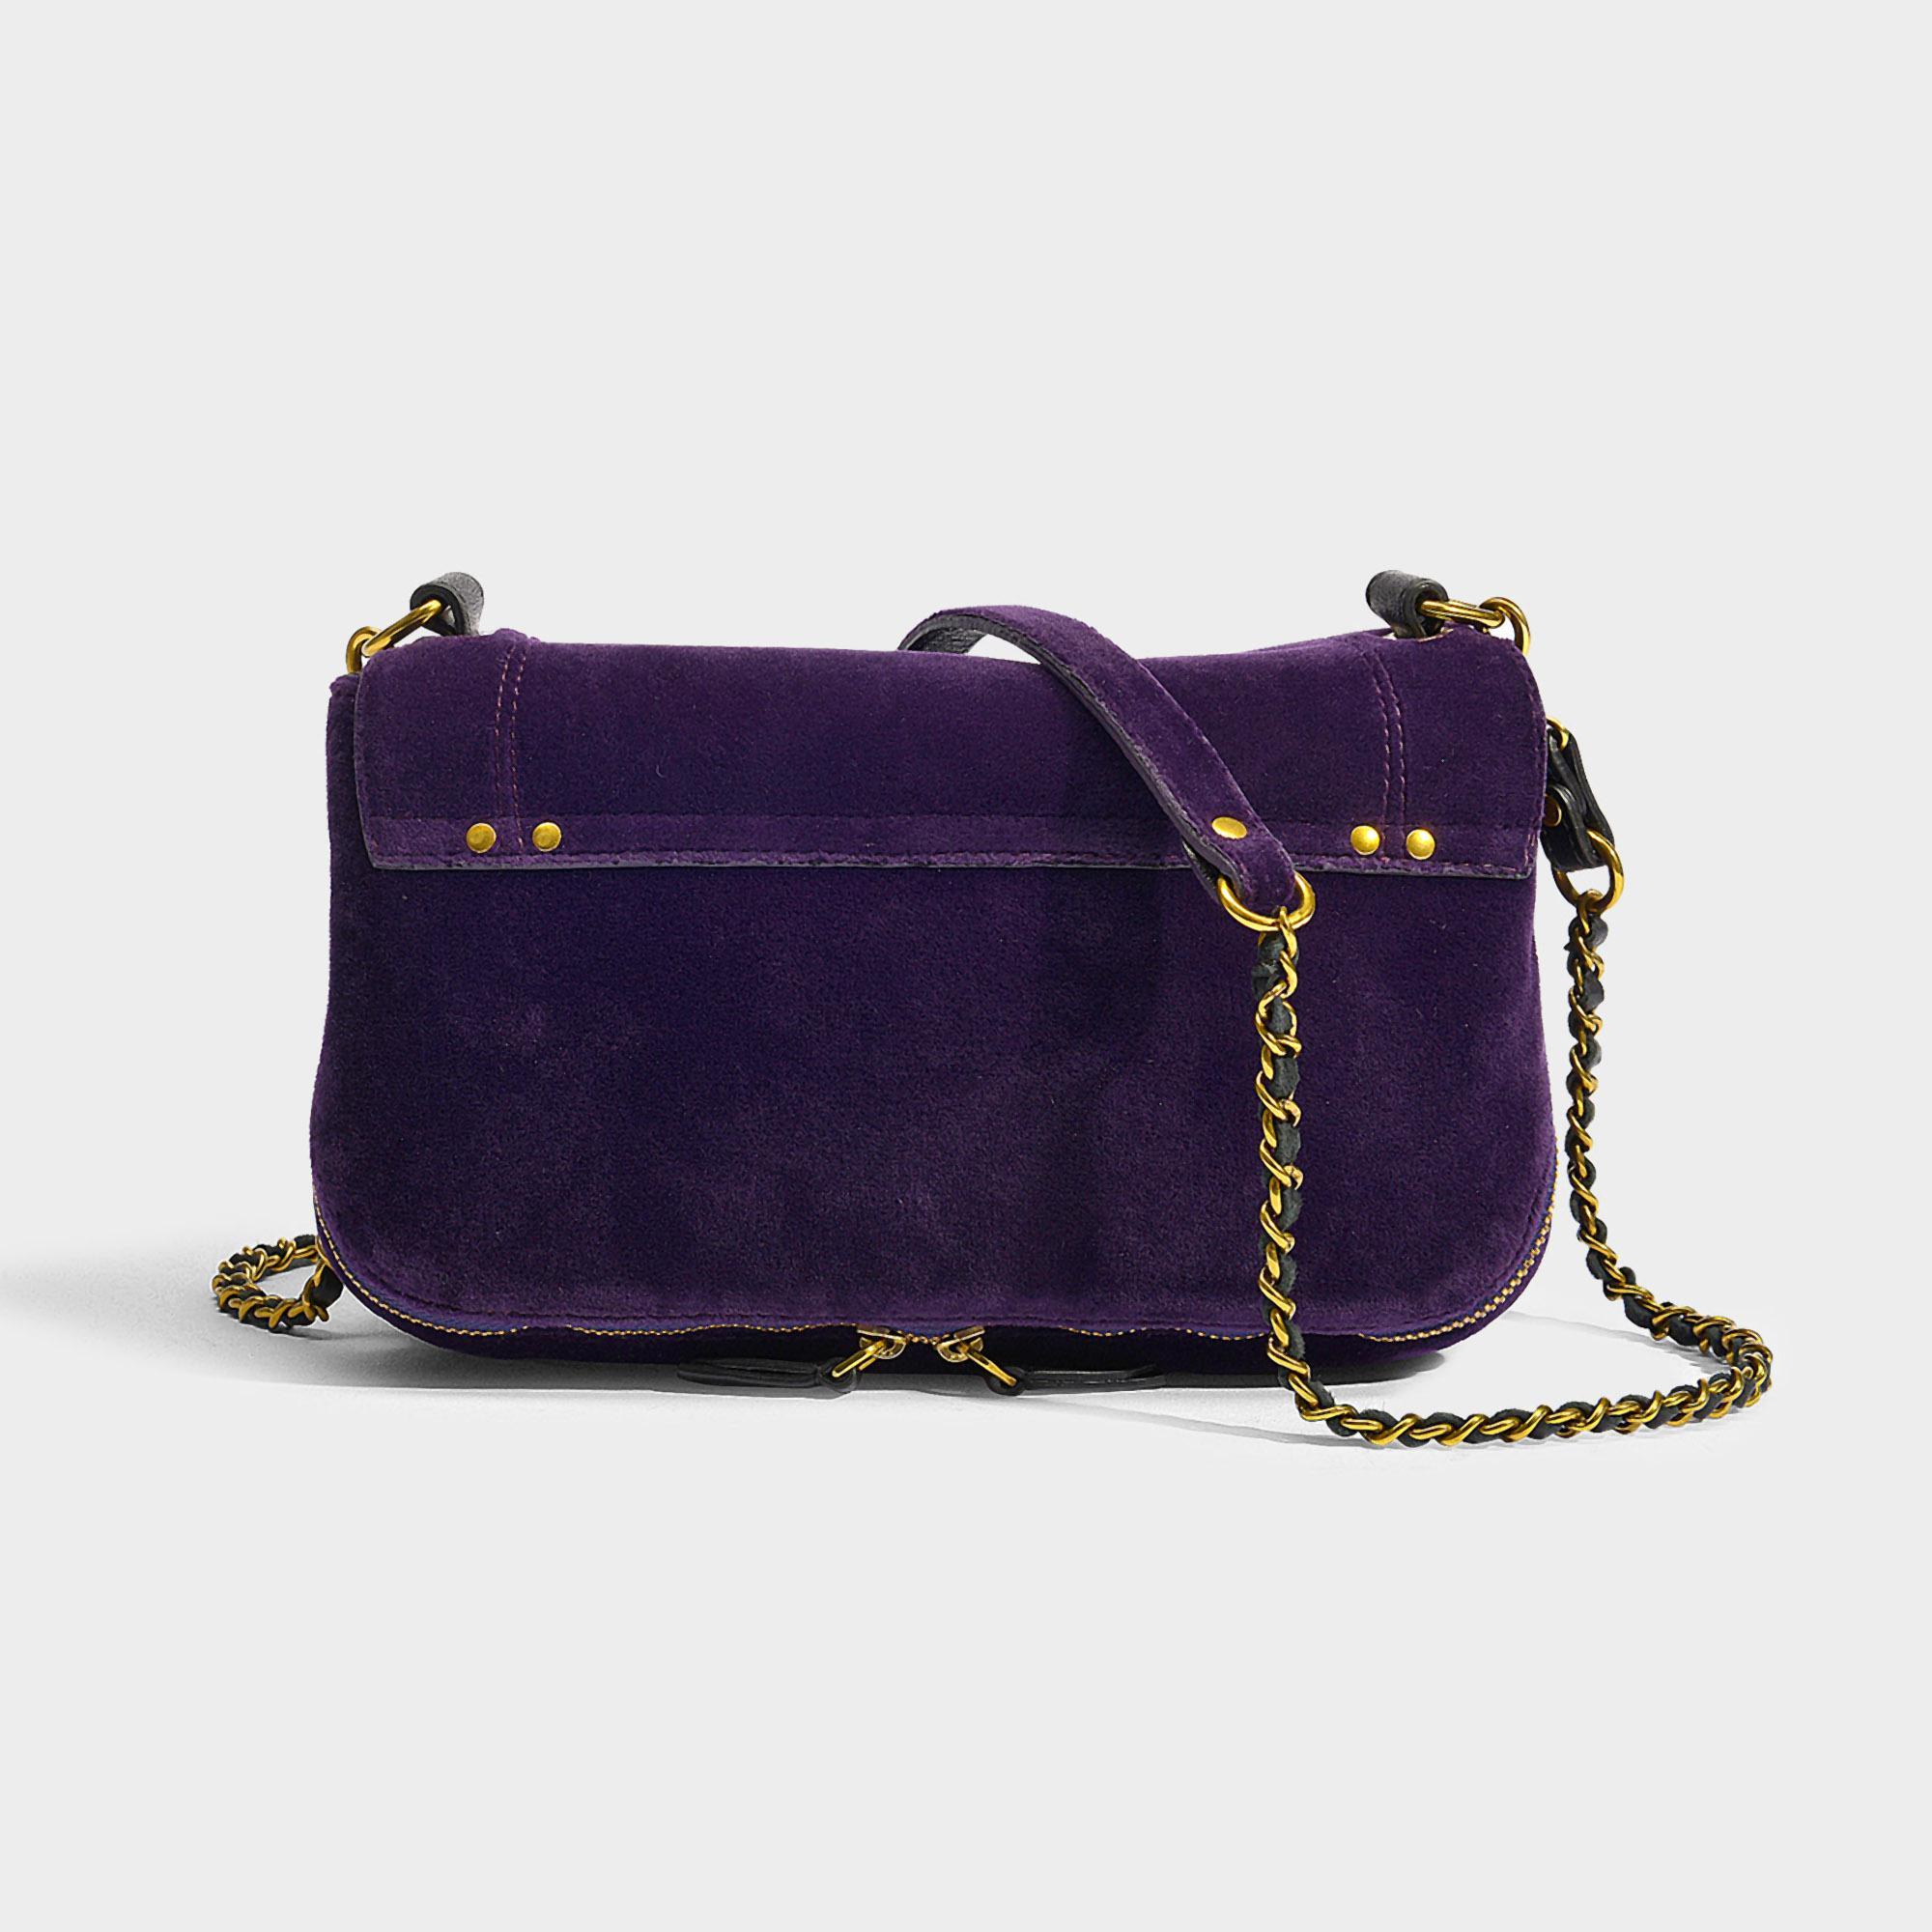 Jérôme Dreyfuss Bobi Crossbody Bag In Purple Velvet Lambskin